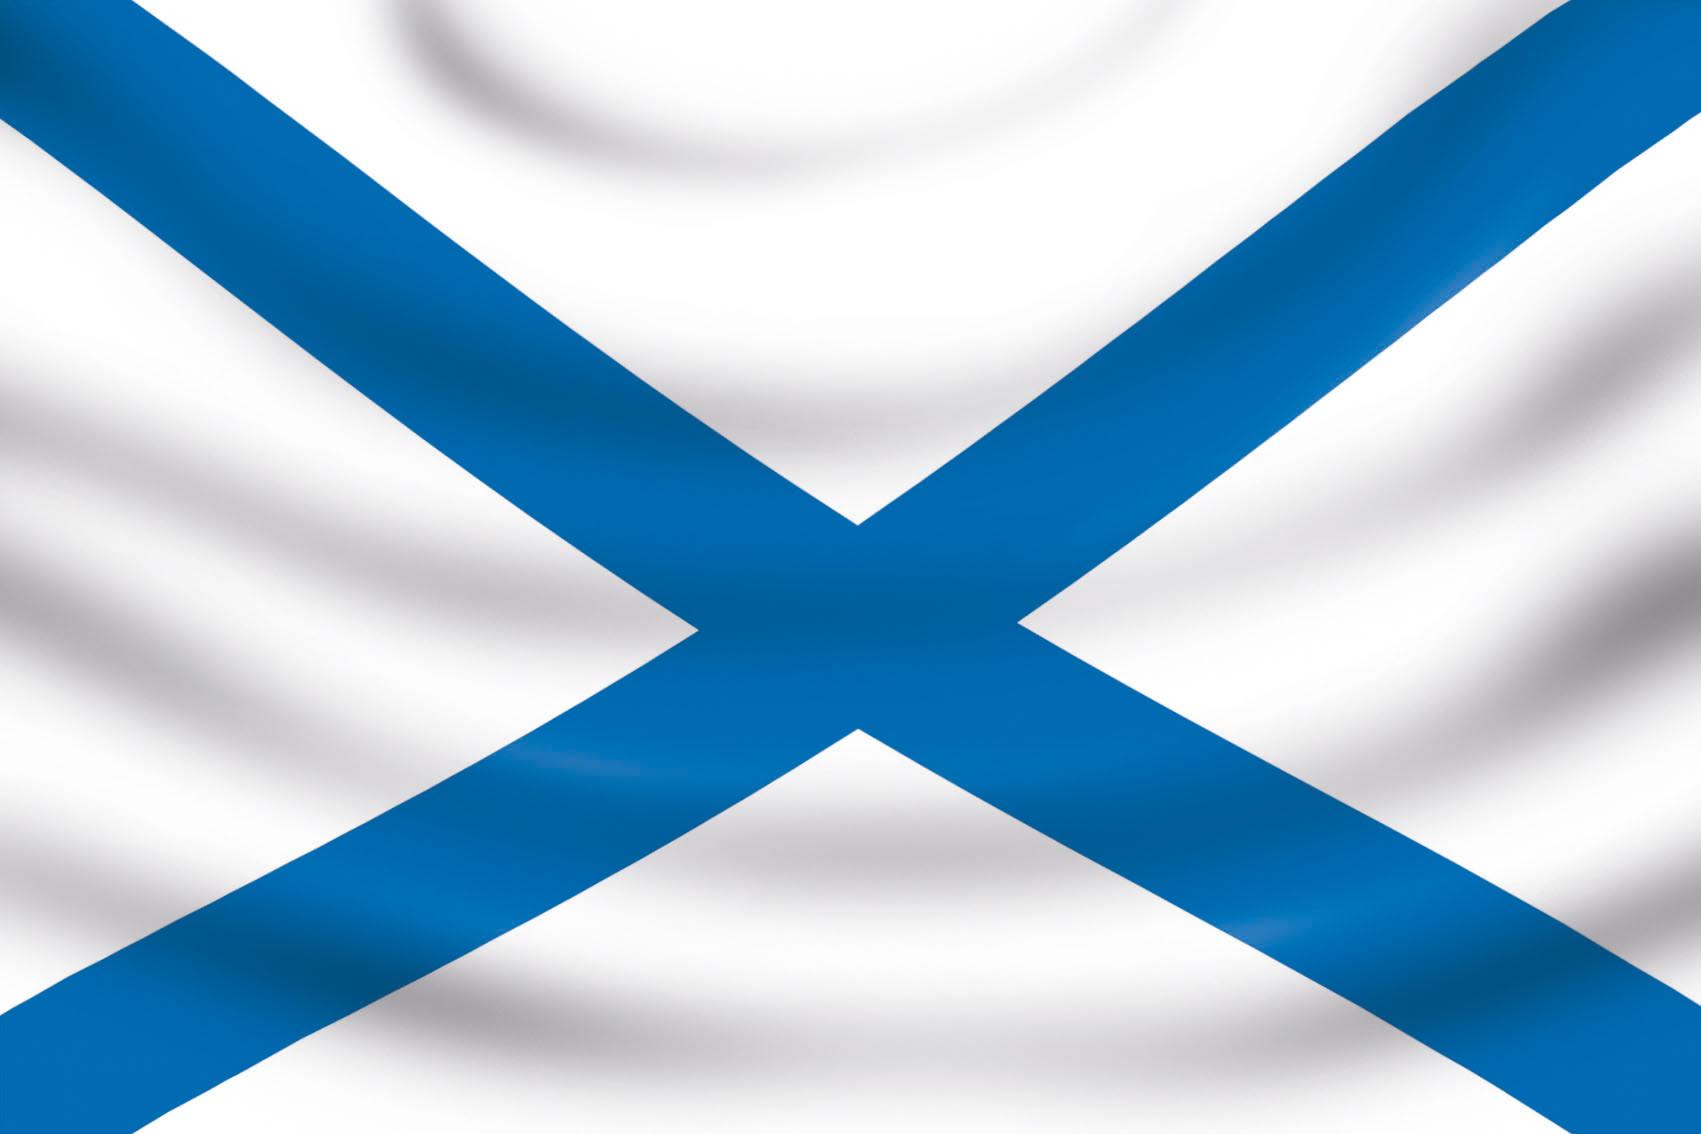 Флаг | энциклопедия кругосвет